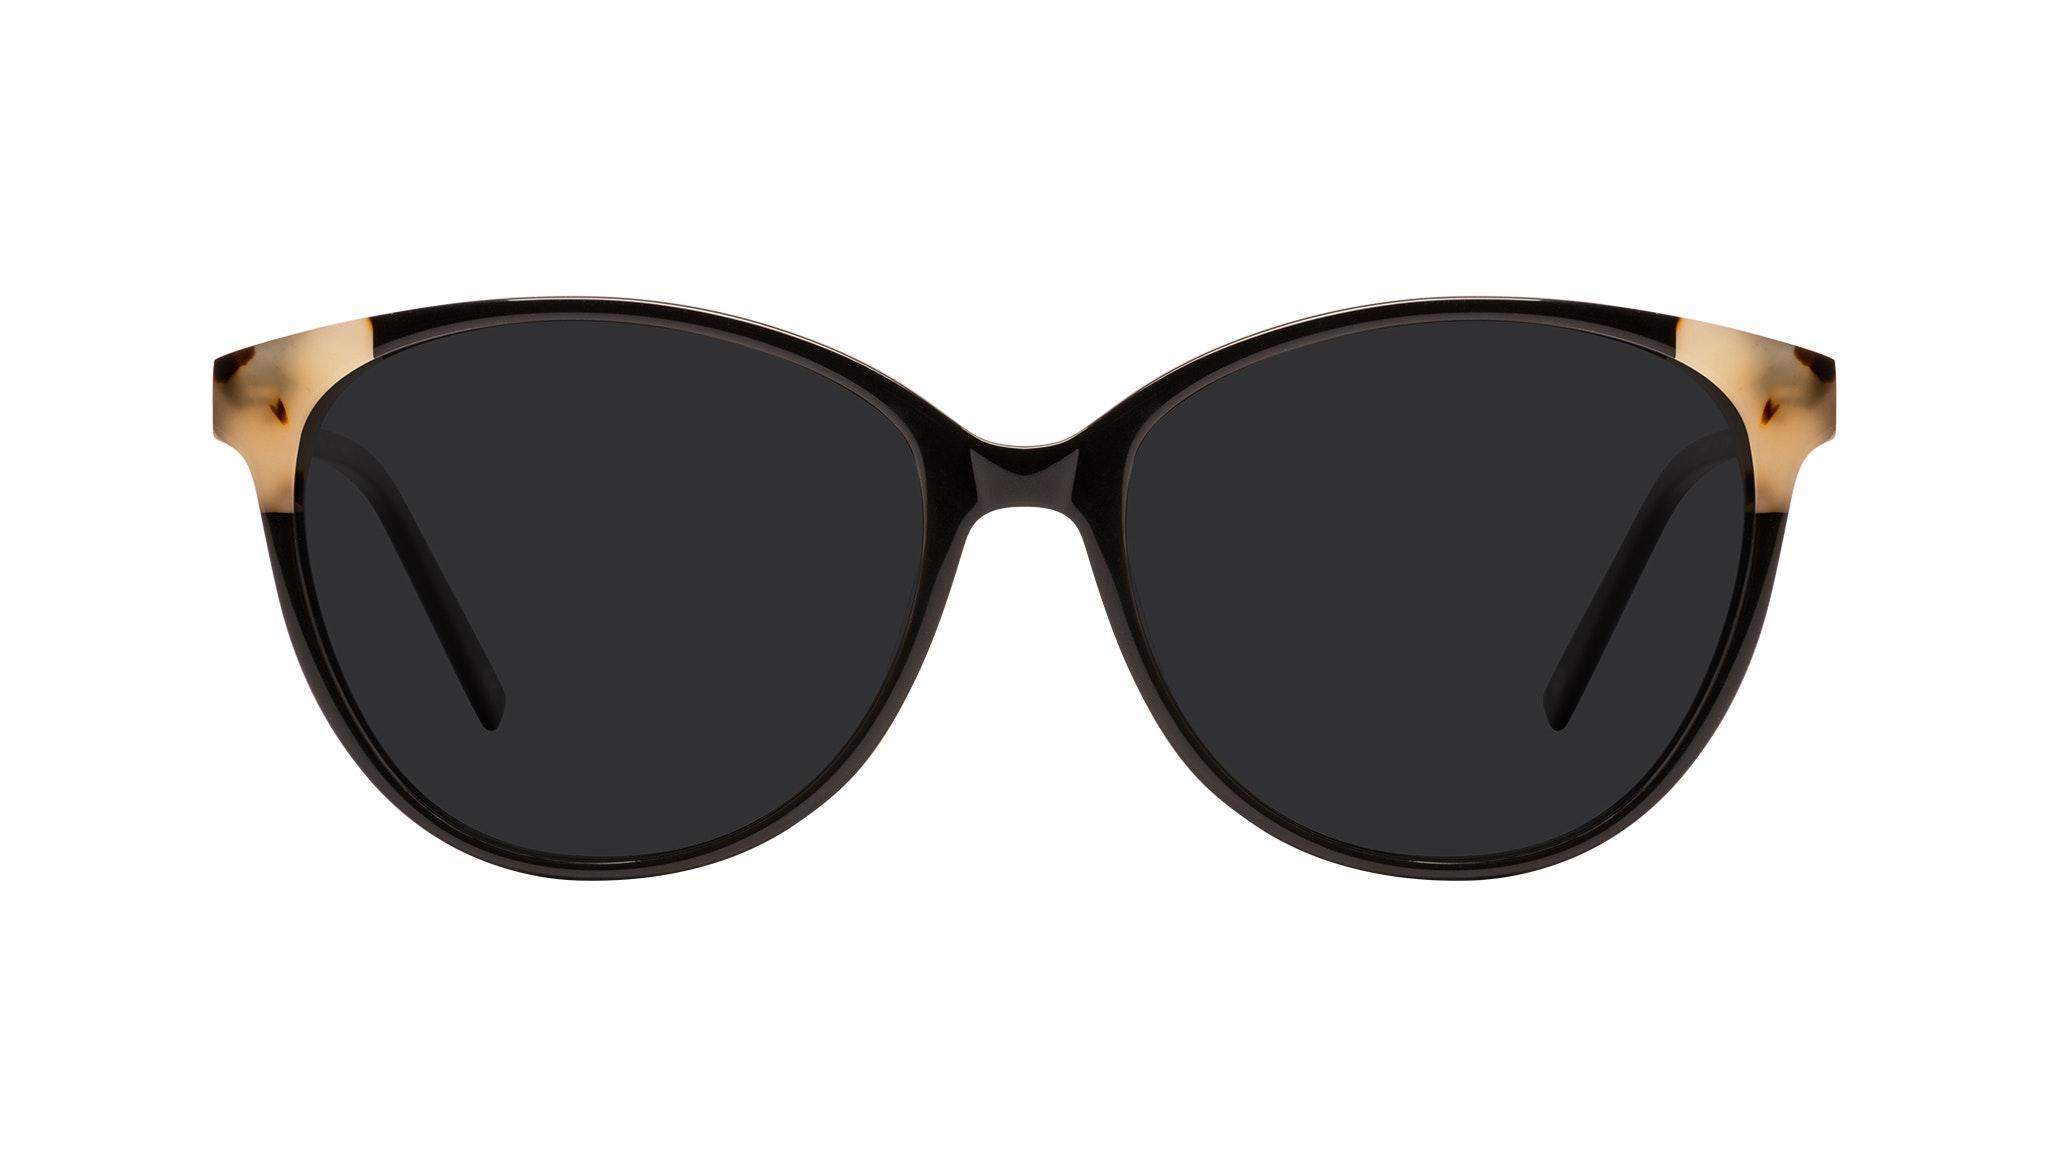 Affordable Fashion Glasses Round Sunglasses Women Imagine II Plus Ebony Granite Front